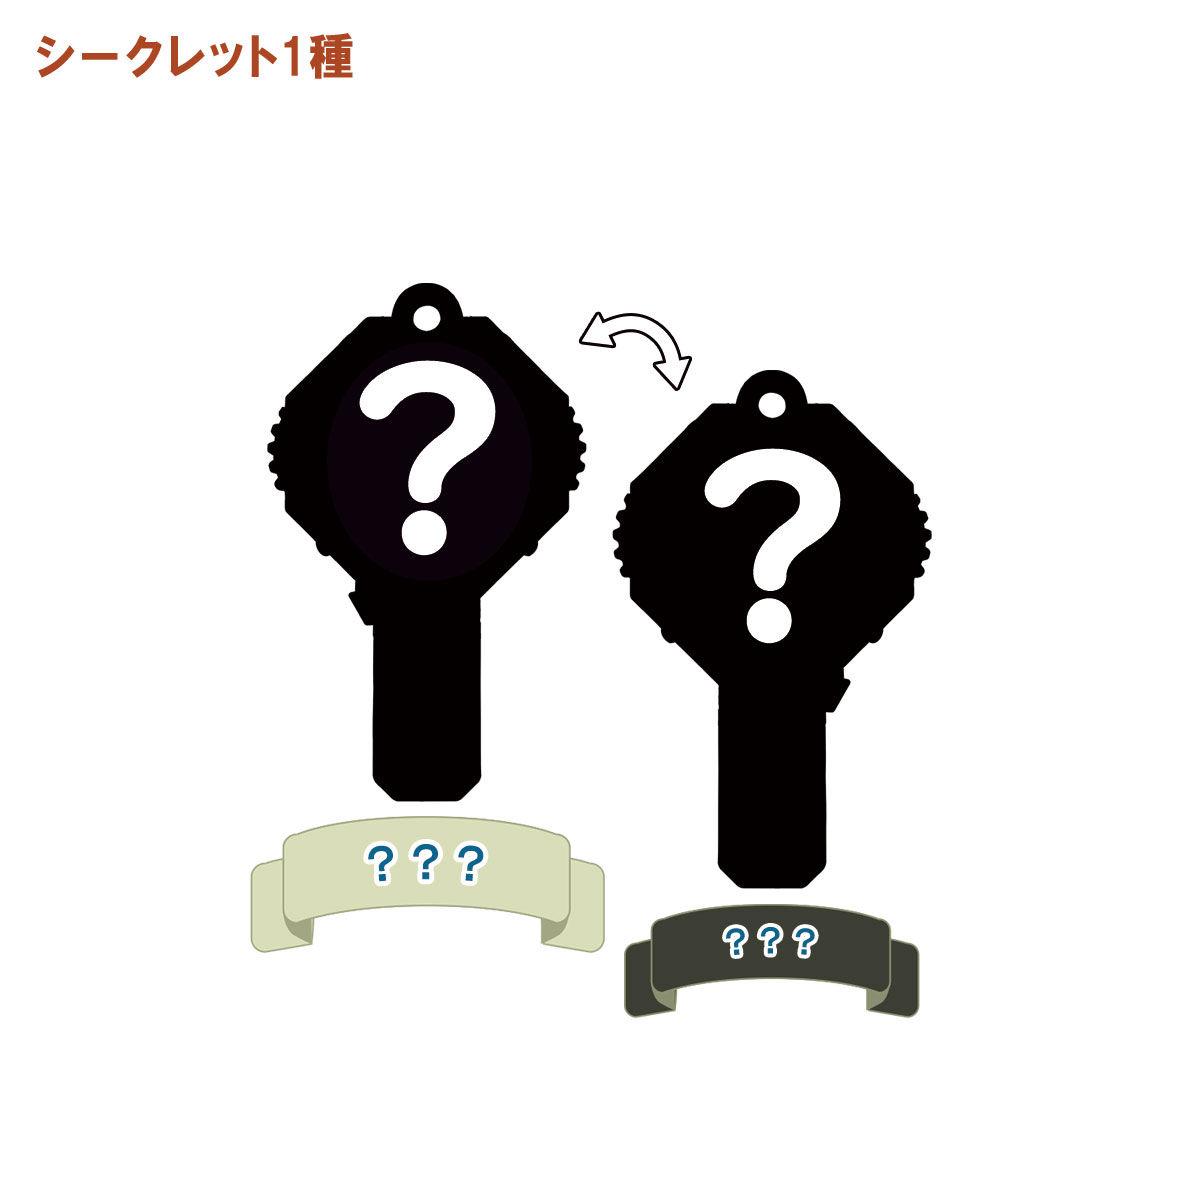 妖怪アークK 6 ~救え!絶滅危惧妖怪!~